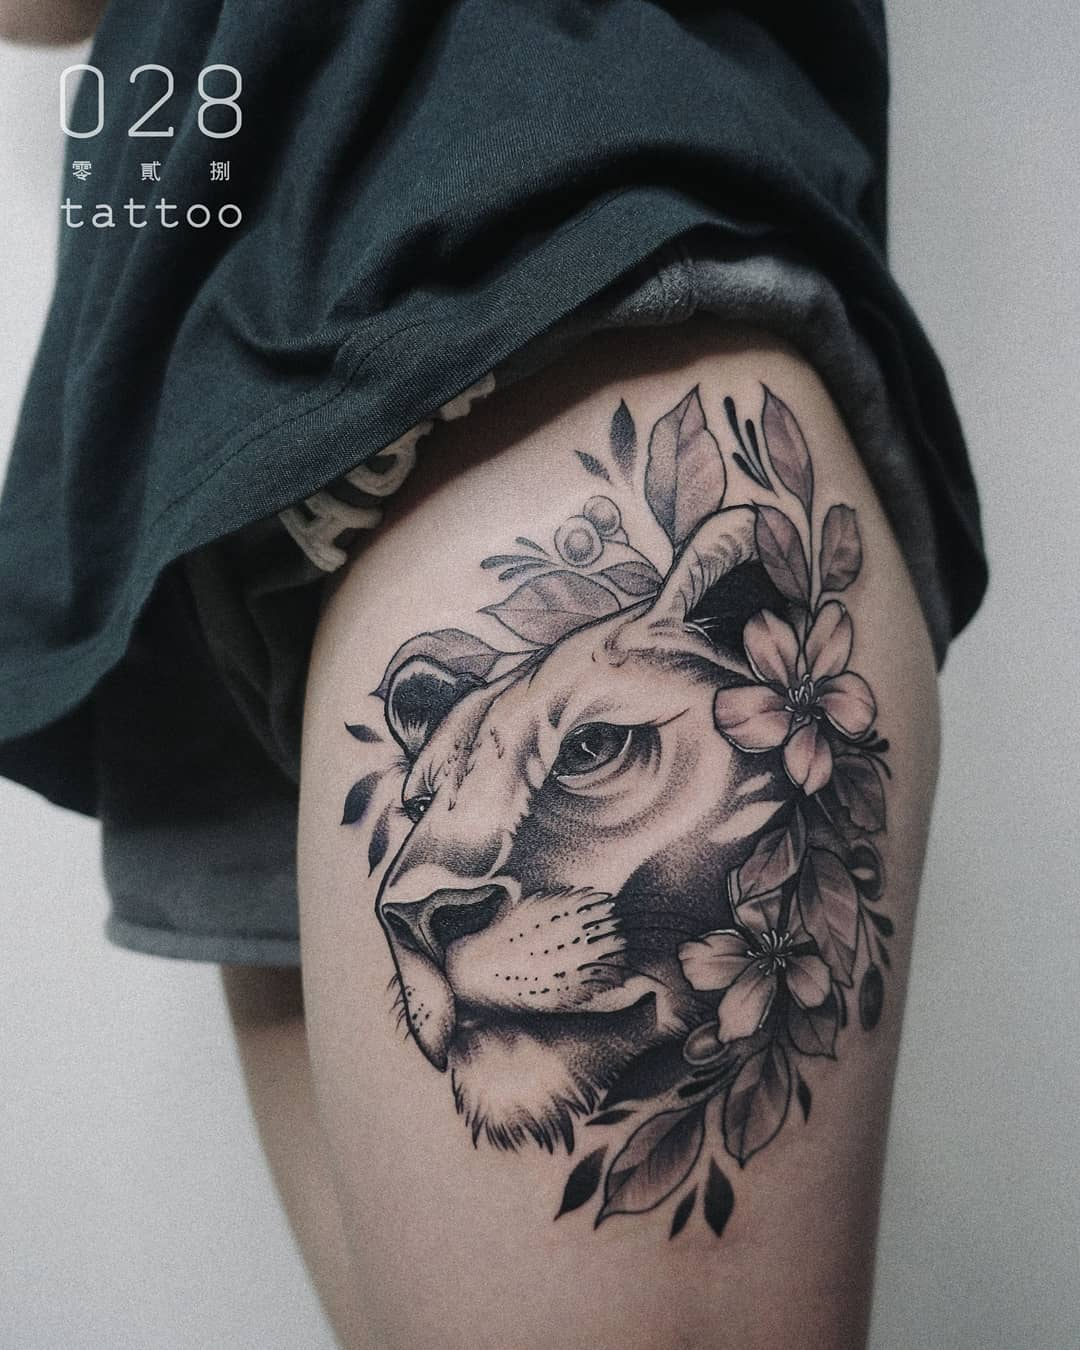 tattoo fiore di pesco leone by @josiewwwww